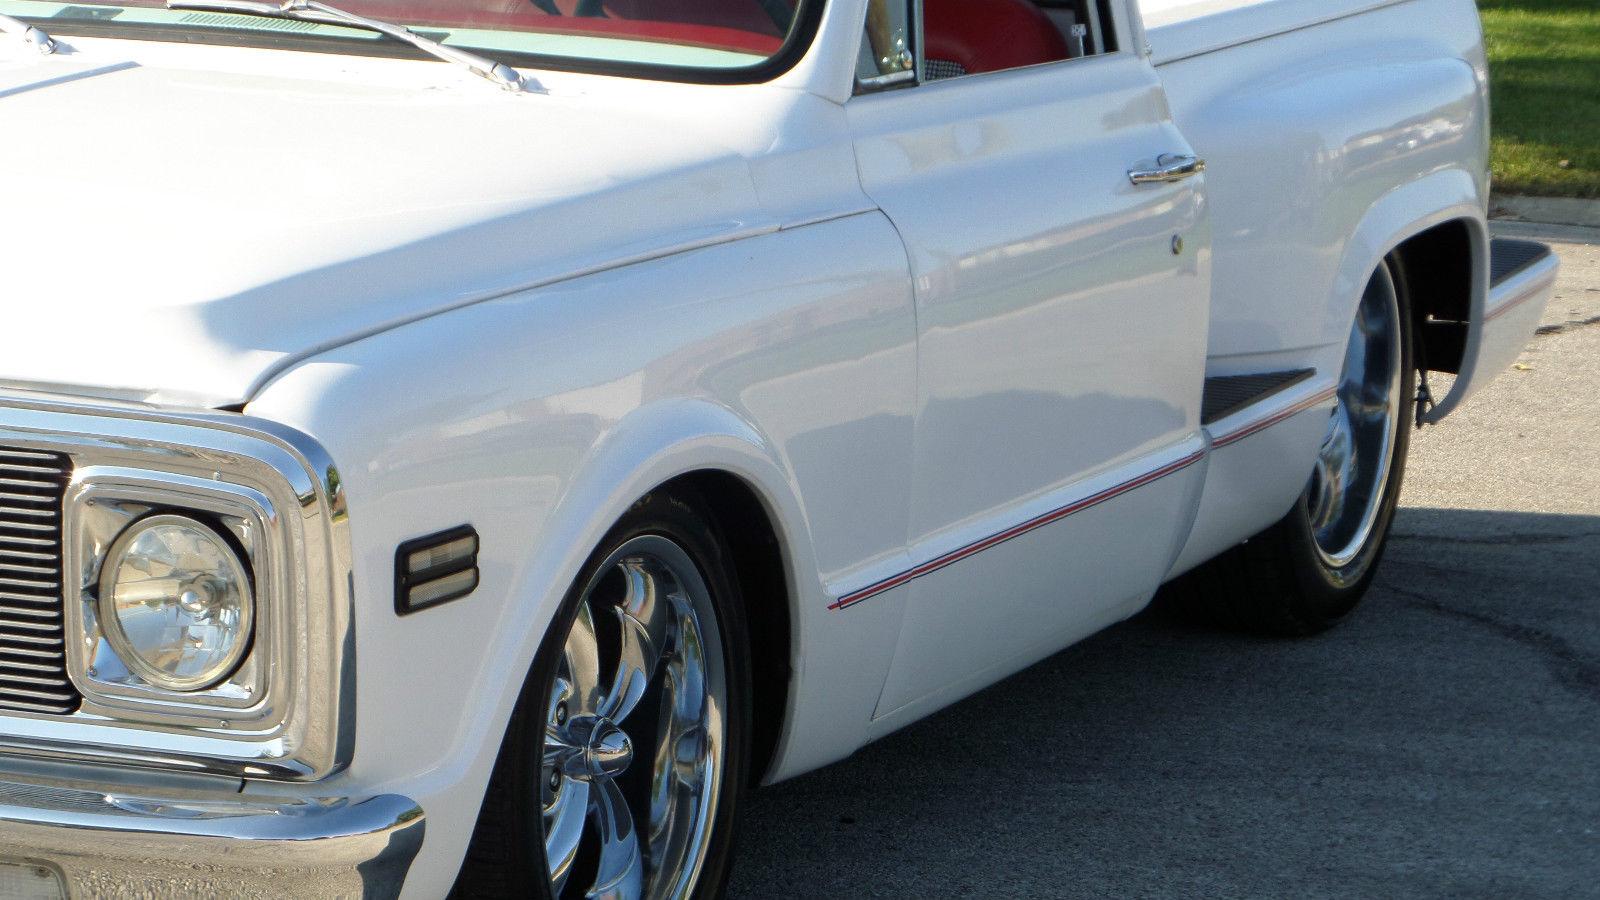 1972 Chevrolet C10 Custom Stepside Shortbed 66 67 68 69 70 71 Ready 1966 Chevy Cheyenne Super 4x4 For Shows